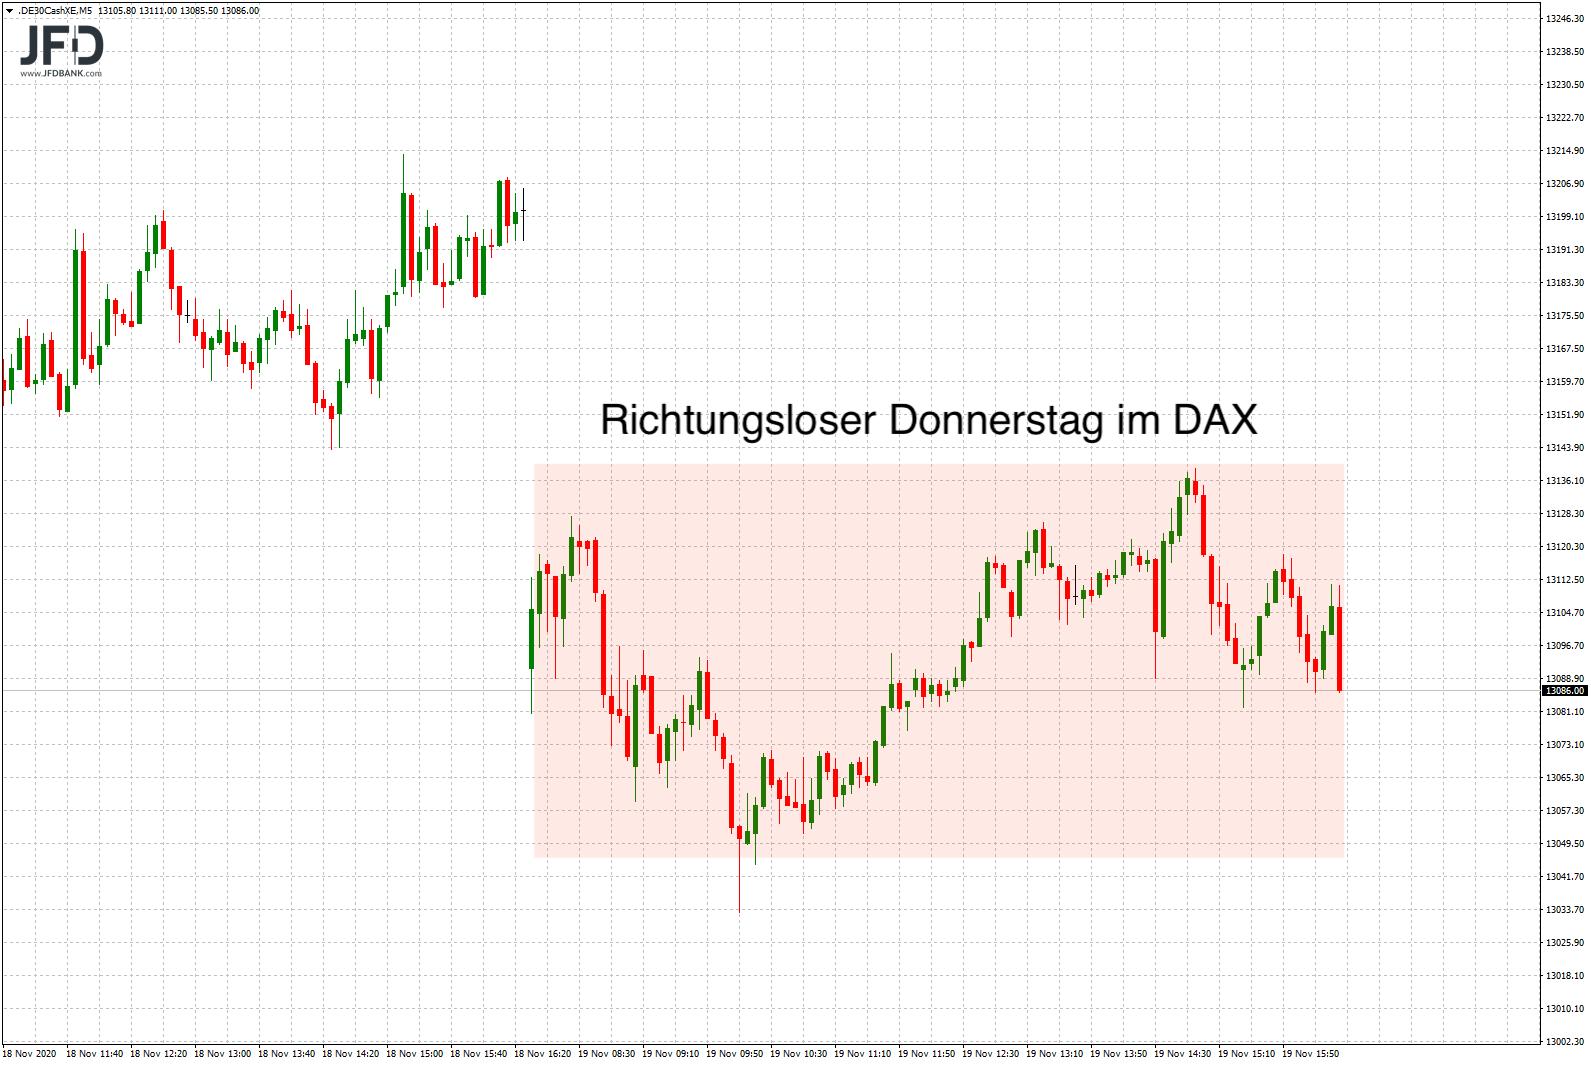 DAX-Handelstag im Rückblick